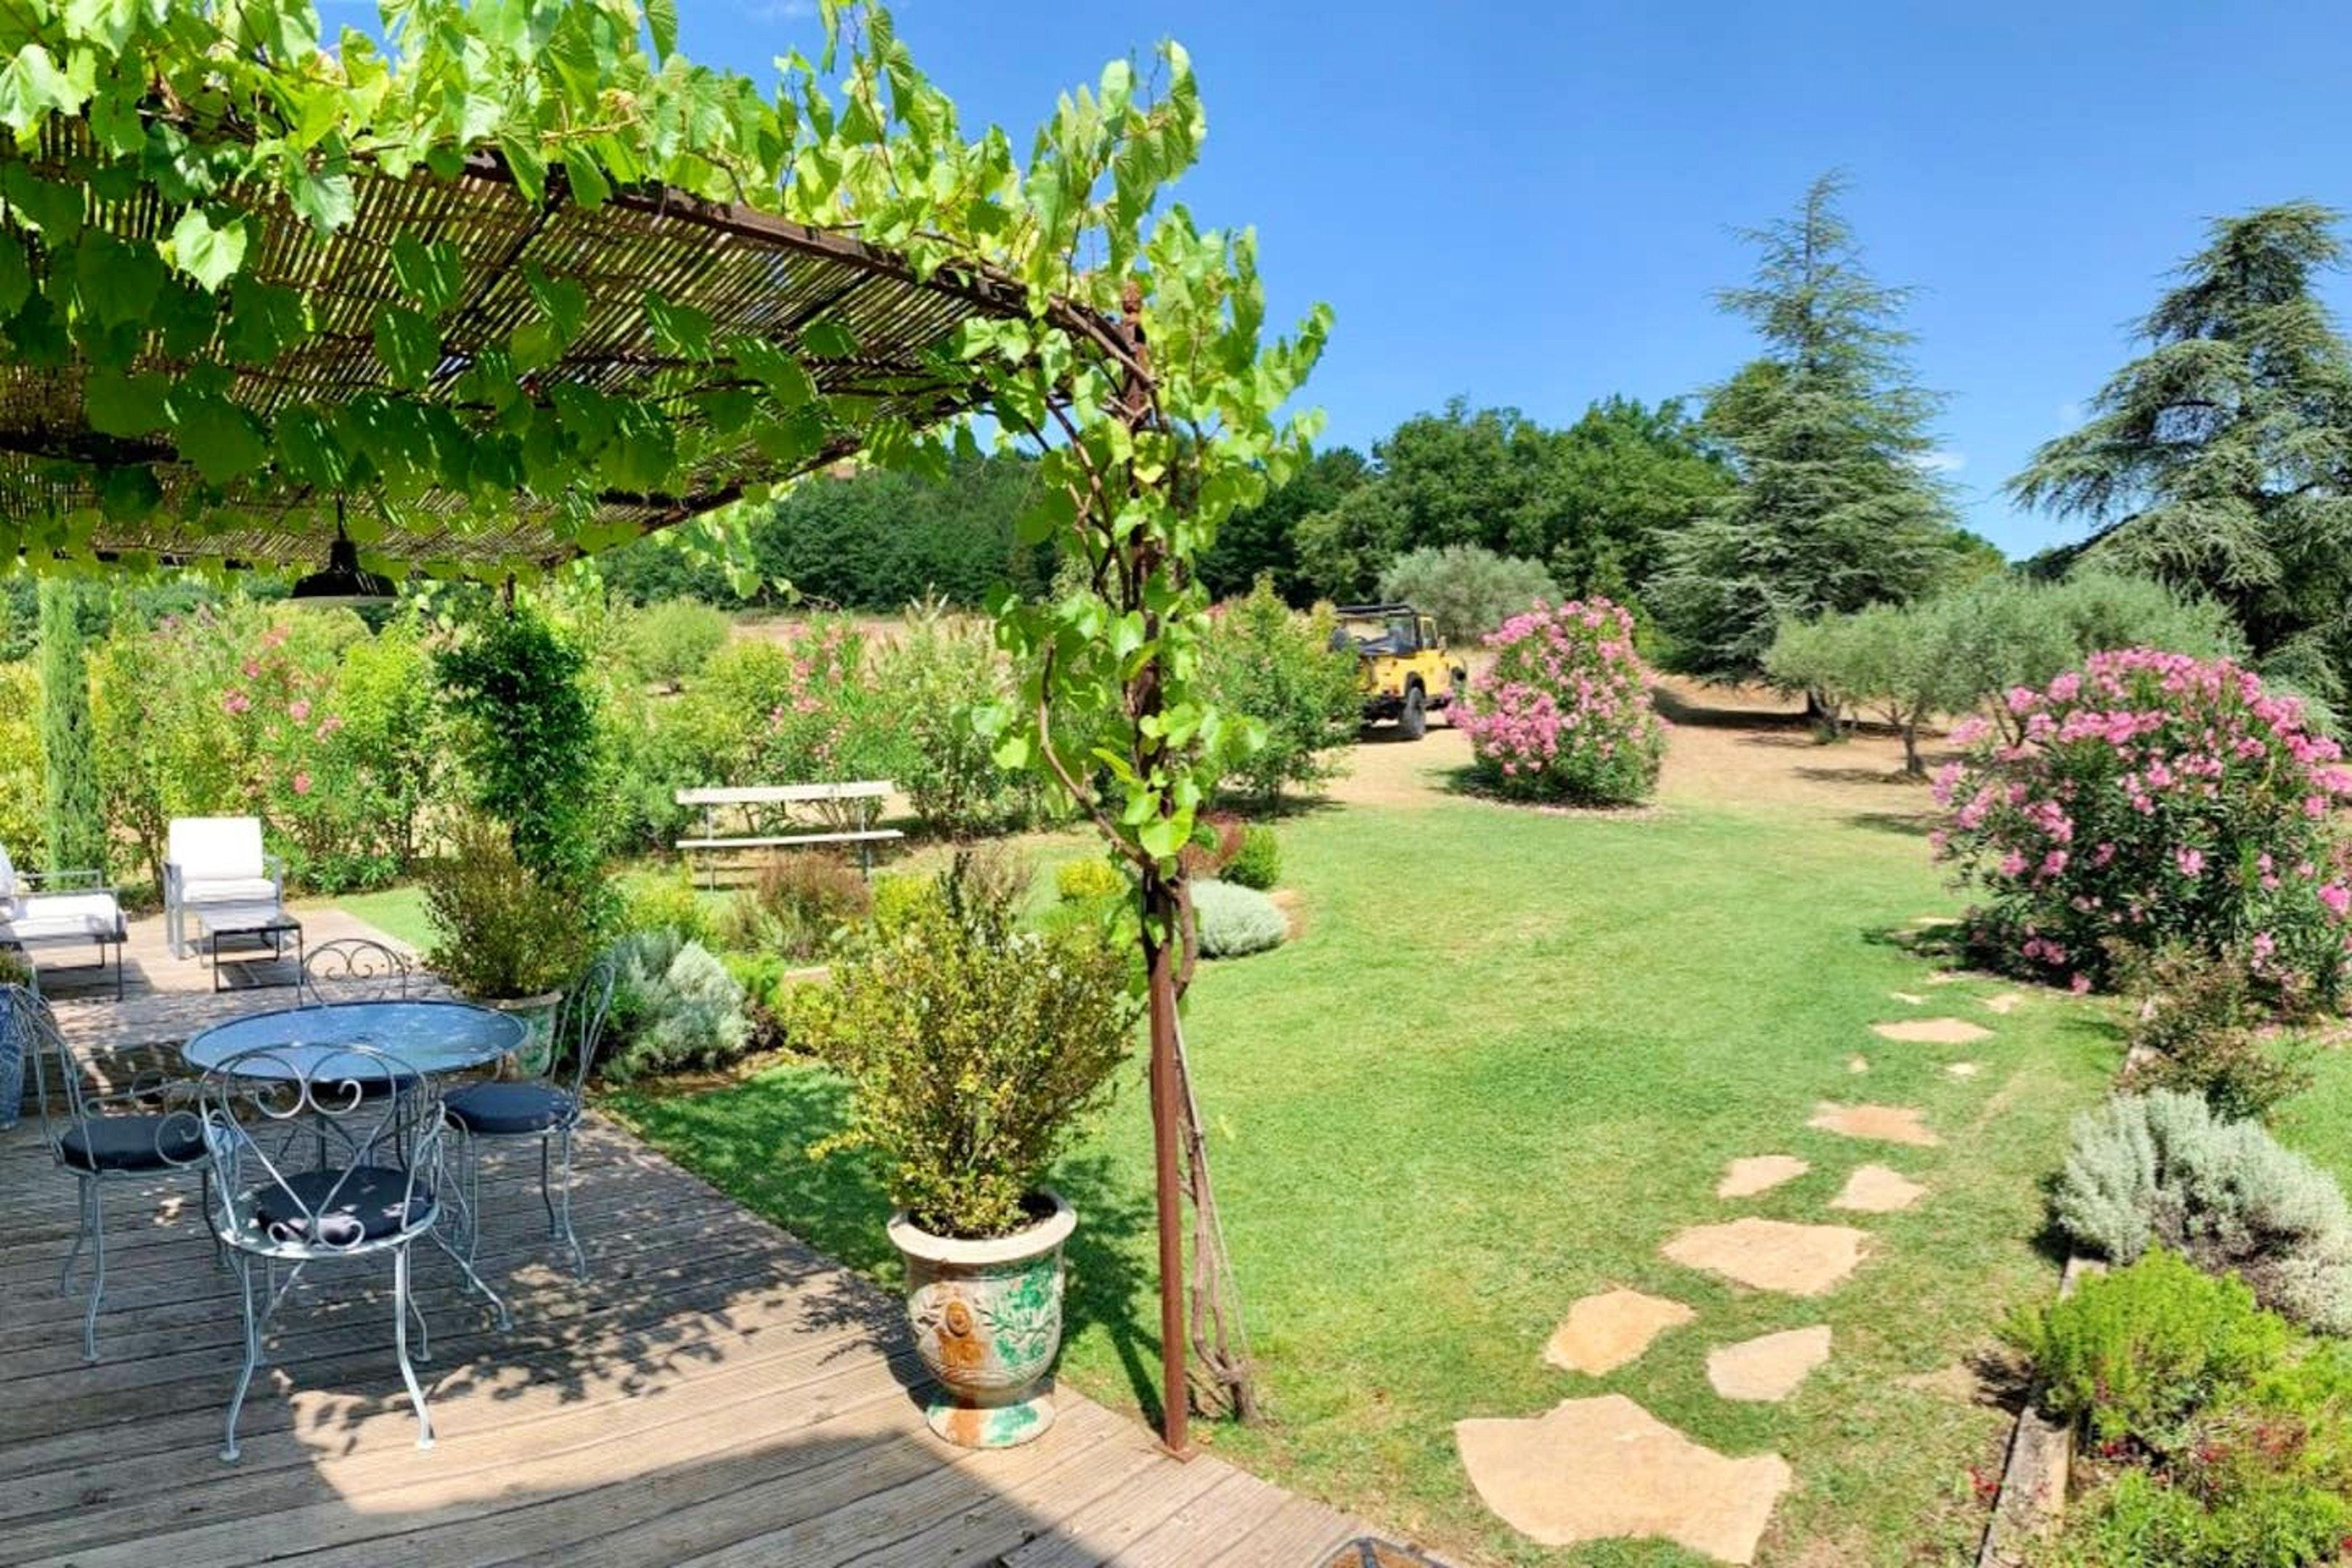 Holiday house Haus mit 2 Schlafzimmern in Roussillon mit Pool, eingezäuntem Garten und W-LAN (2818064), Roussillon, Vaucluse, Provence - Alps - Côte d'Azur, France, picture 31